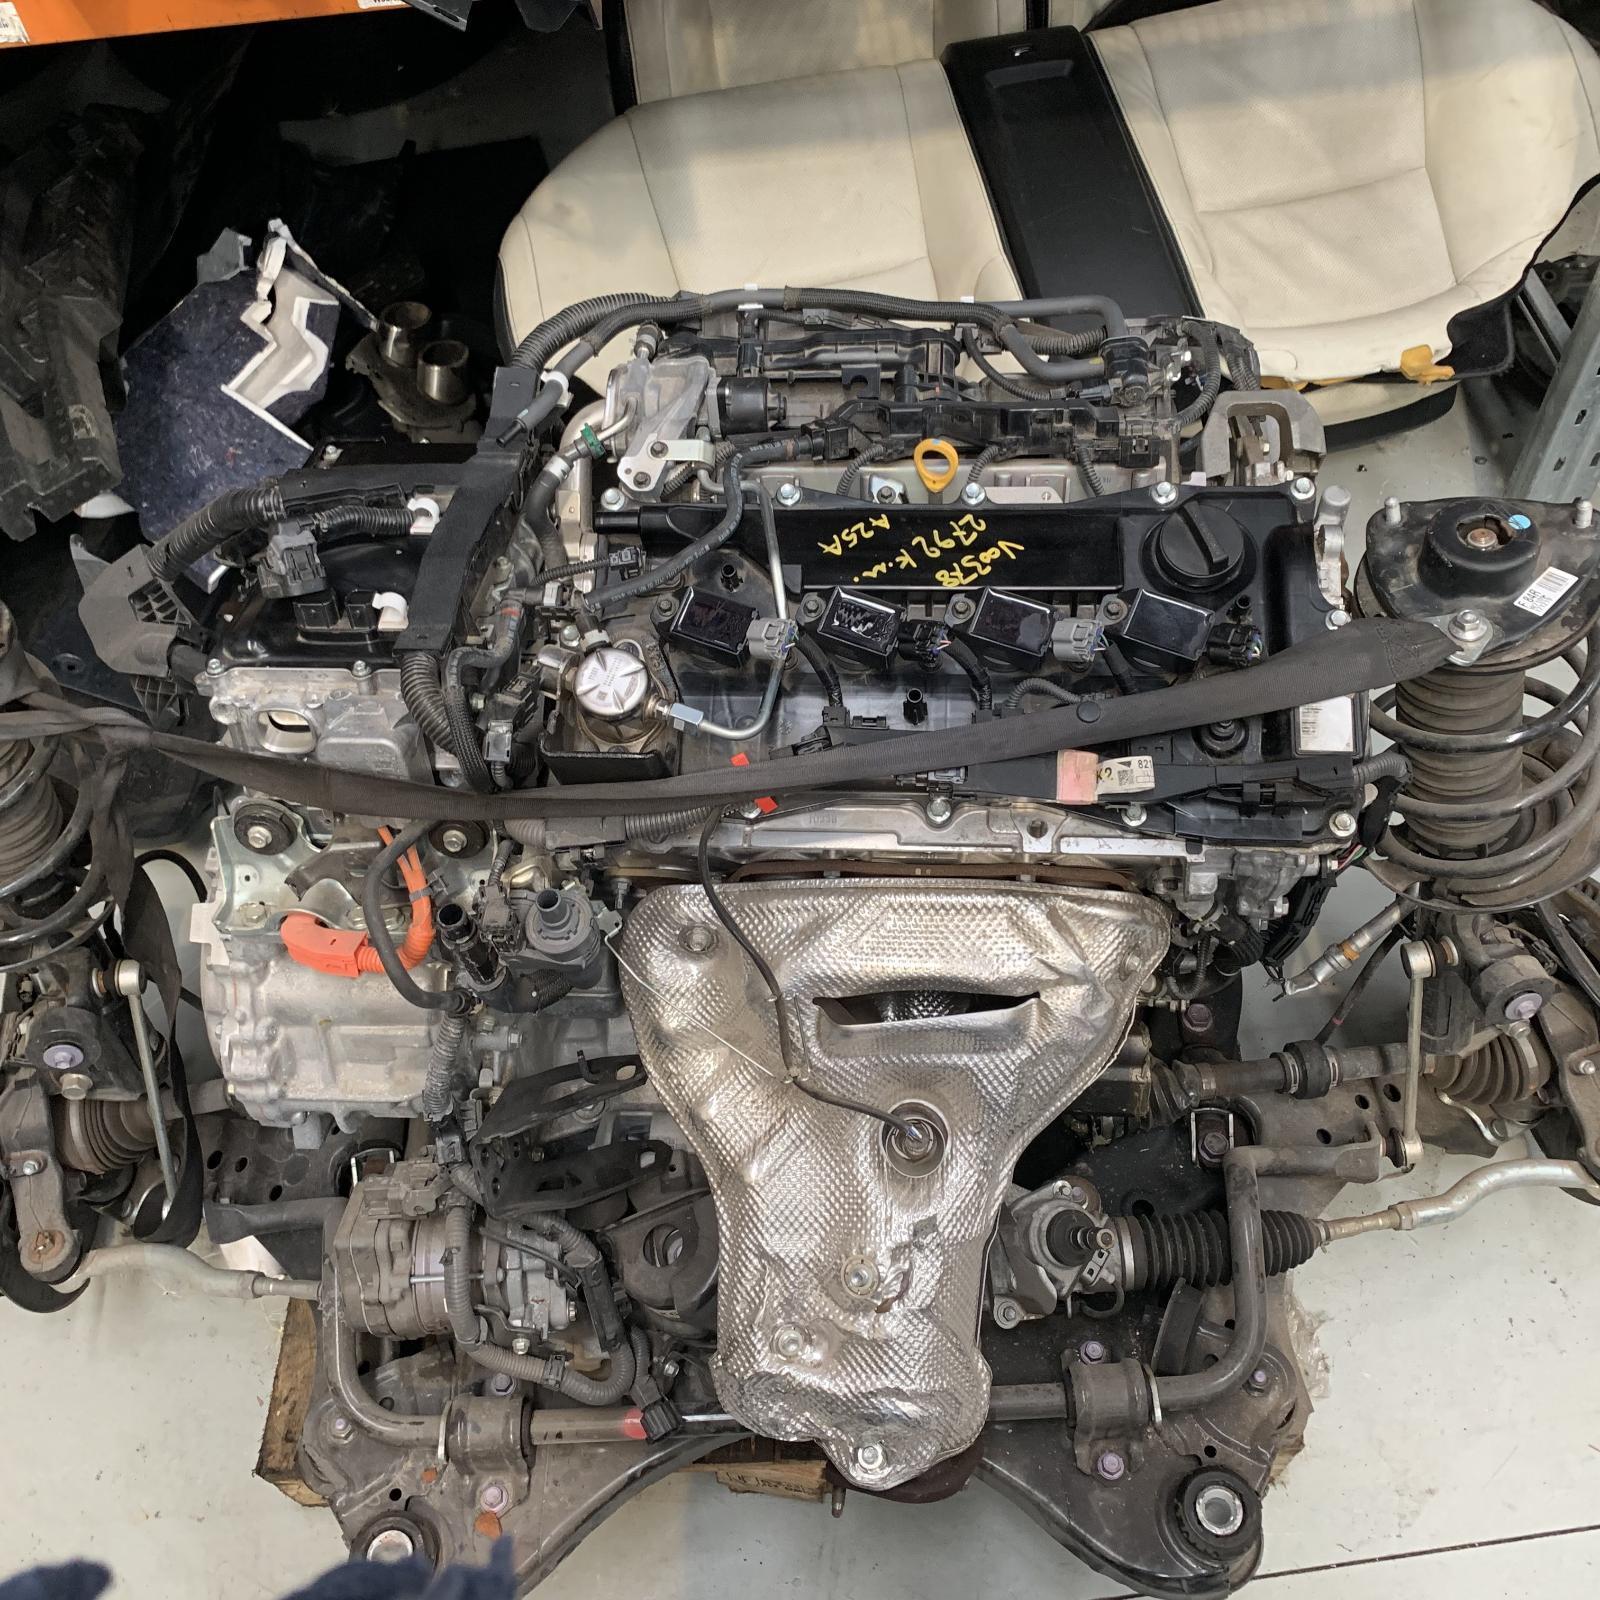 TOYOTA CAMRY, Engine, PETROL, 2.5, A25A-FKS, XV70, 09/17-